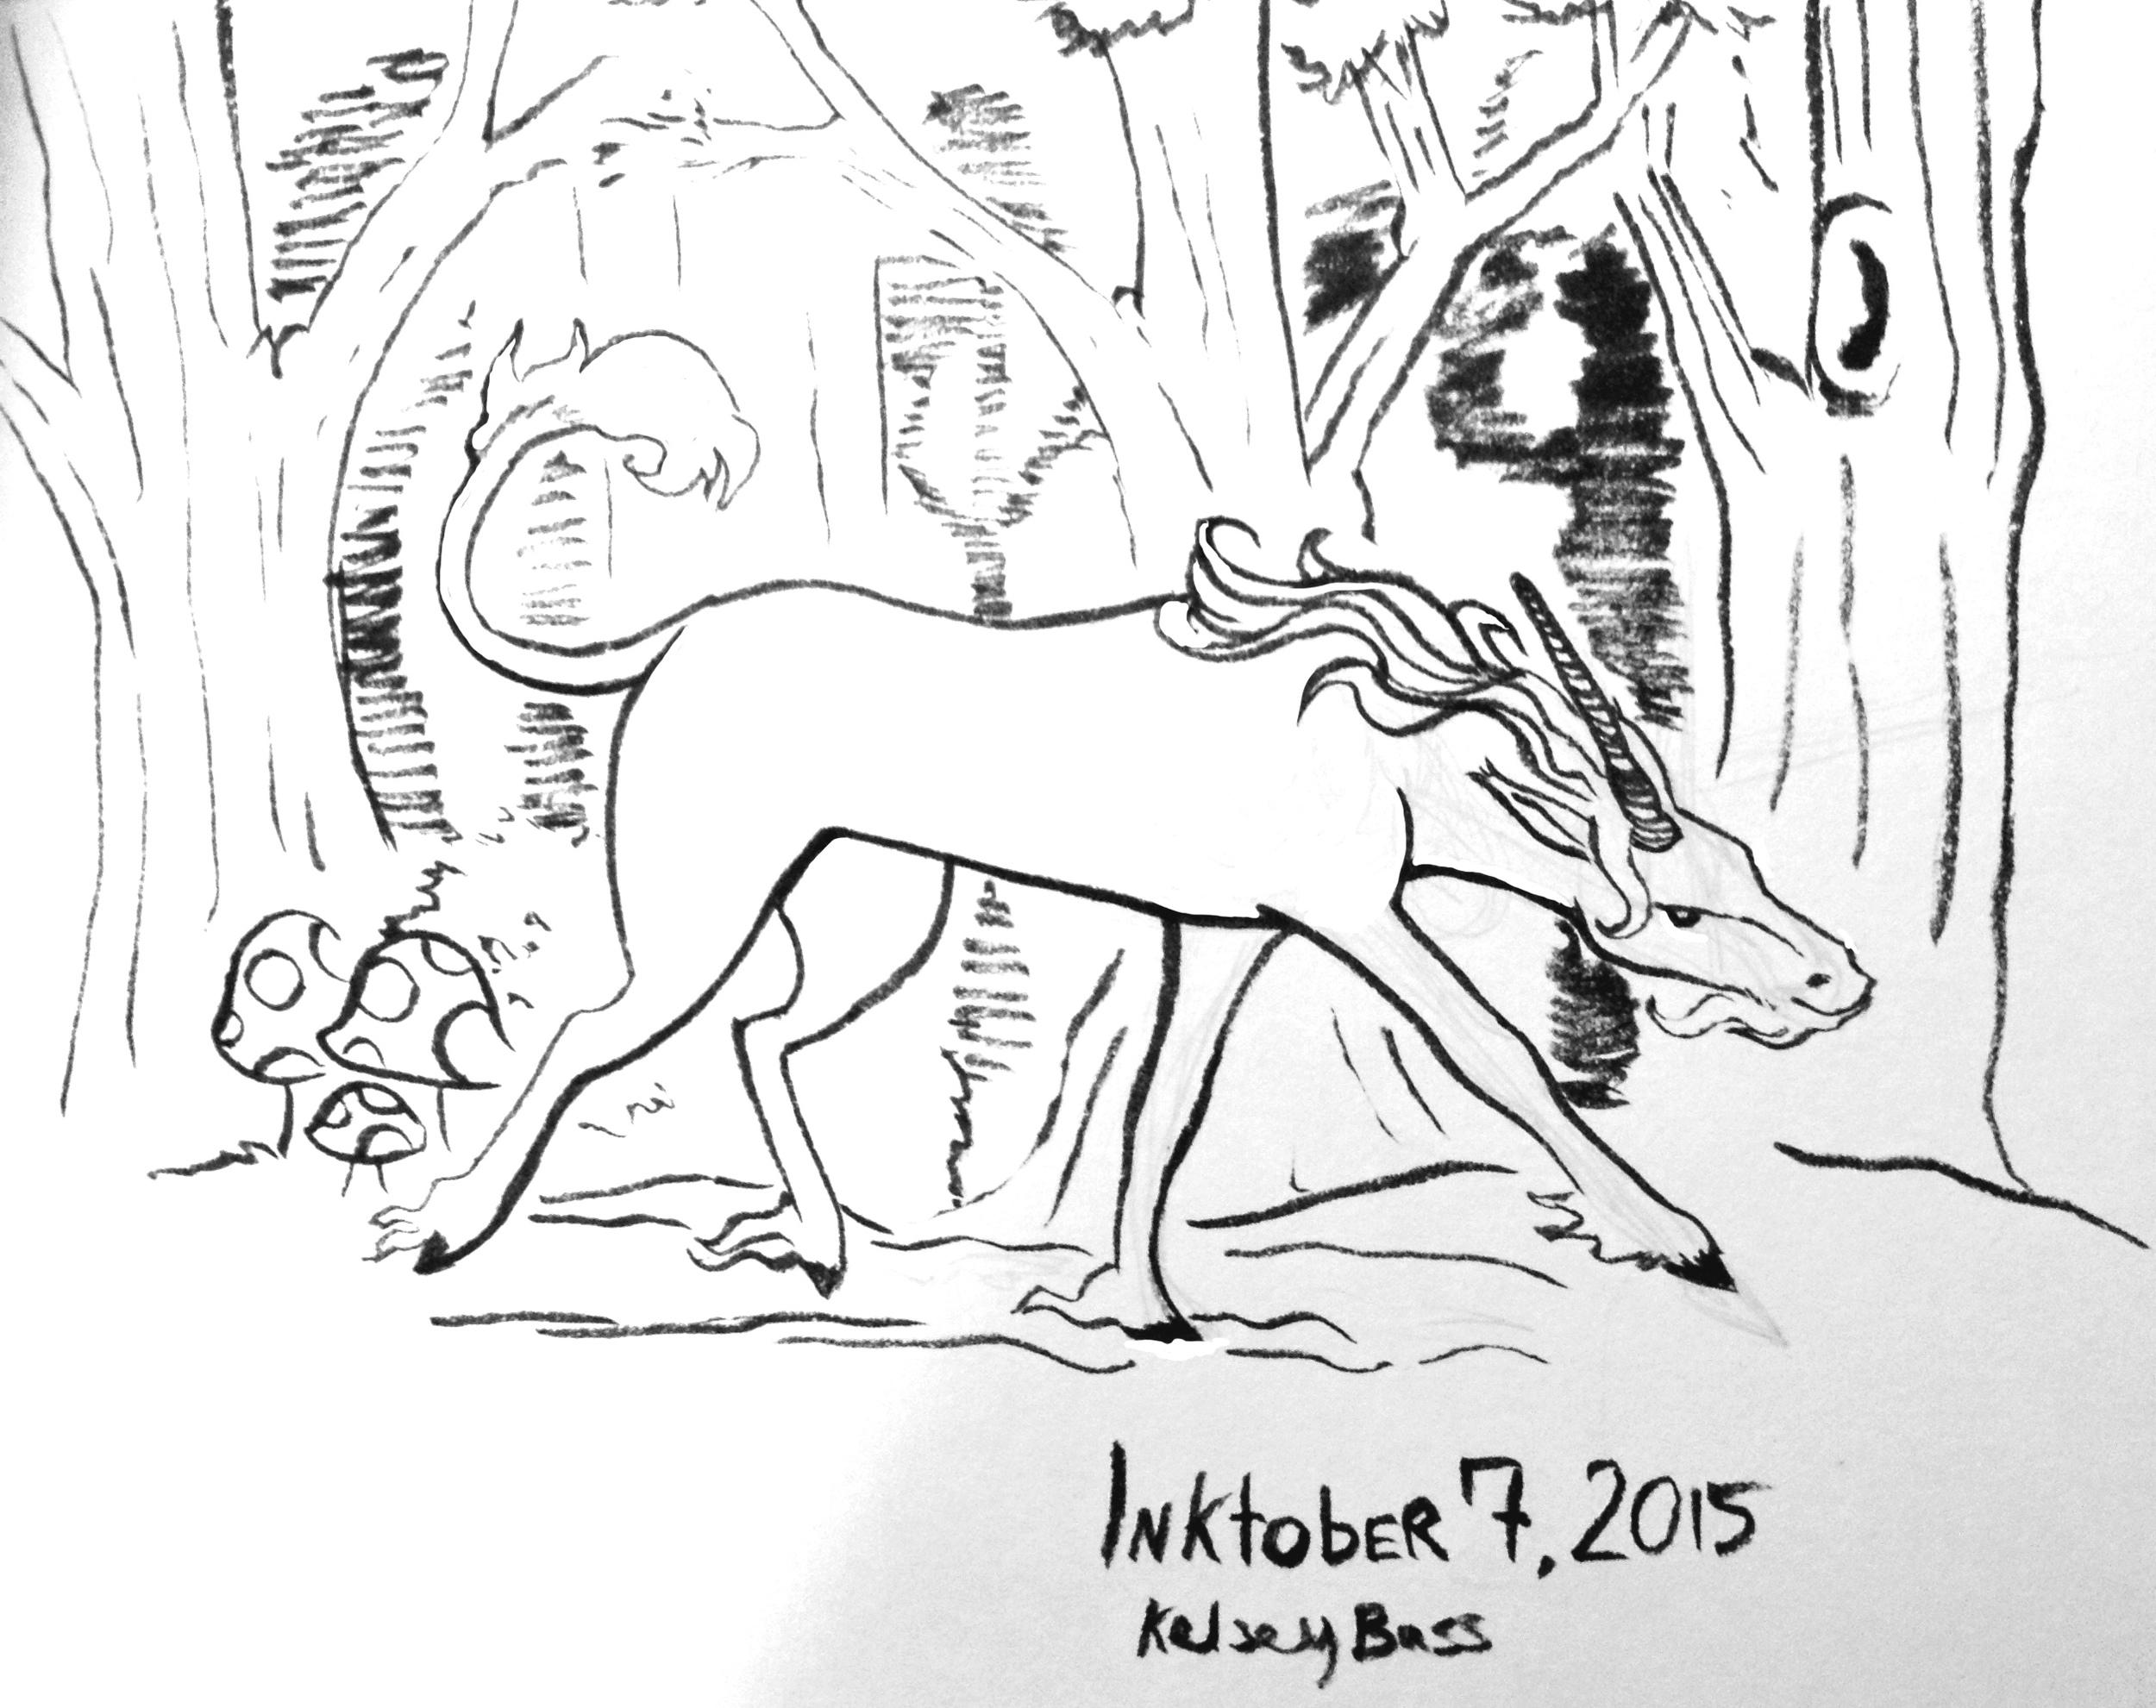 Inktober 7, 2015 I needed to draw some unicorns.